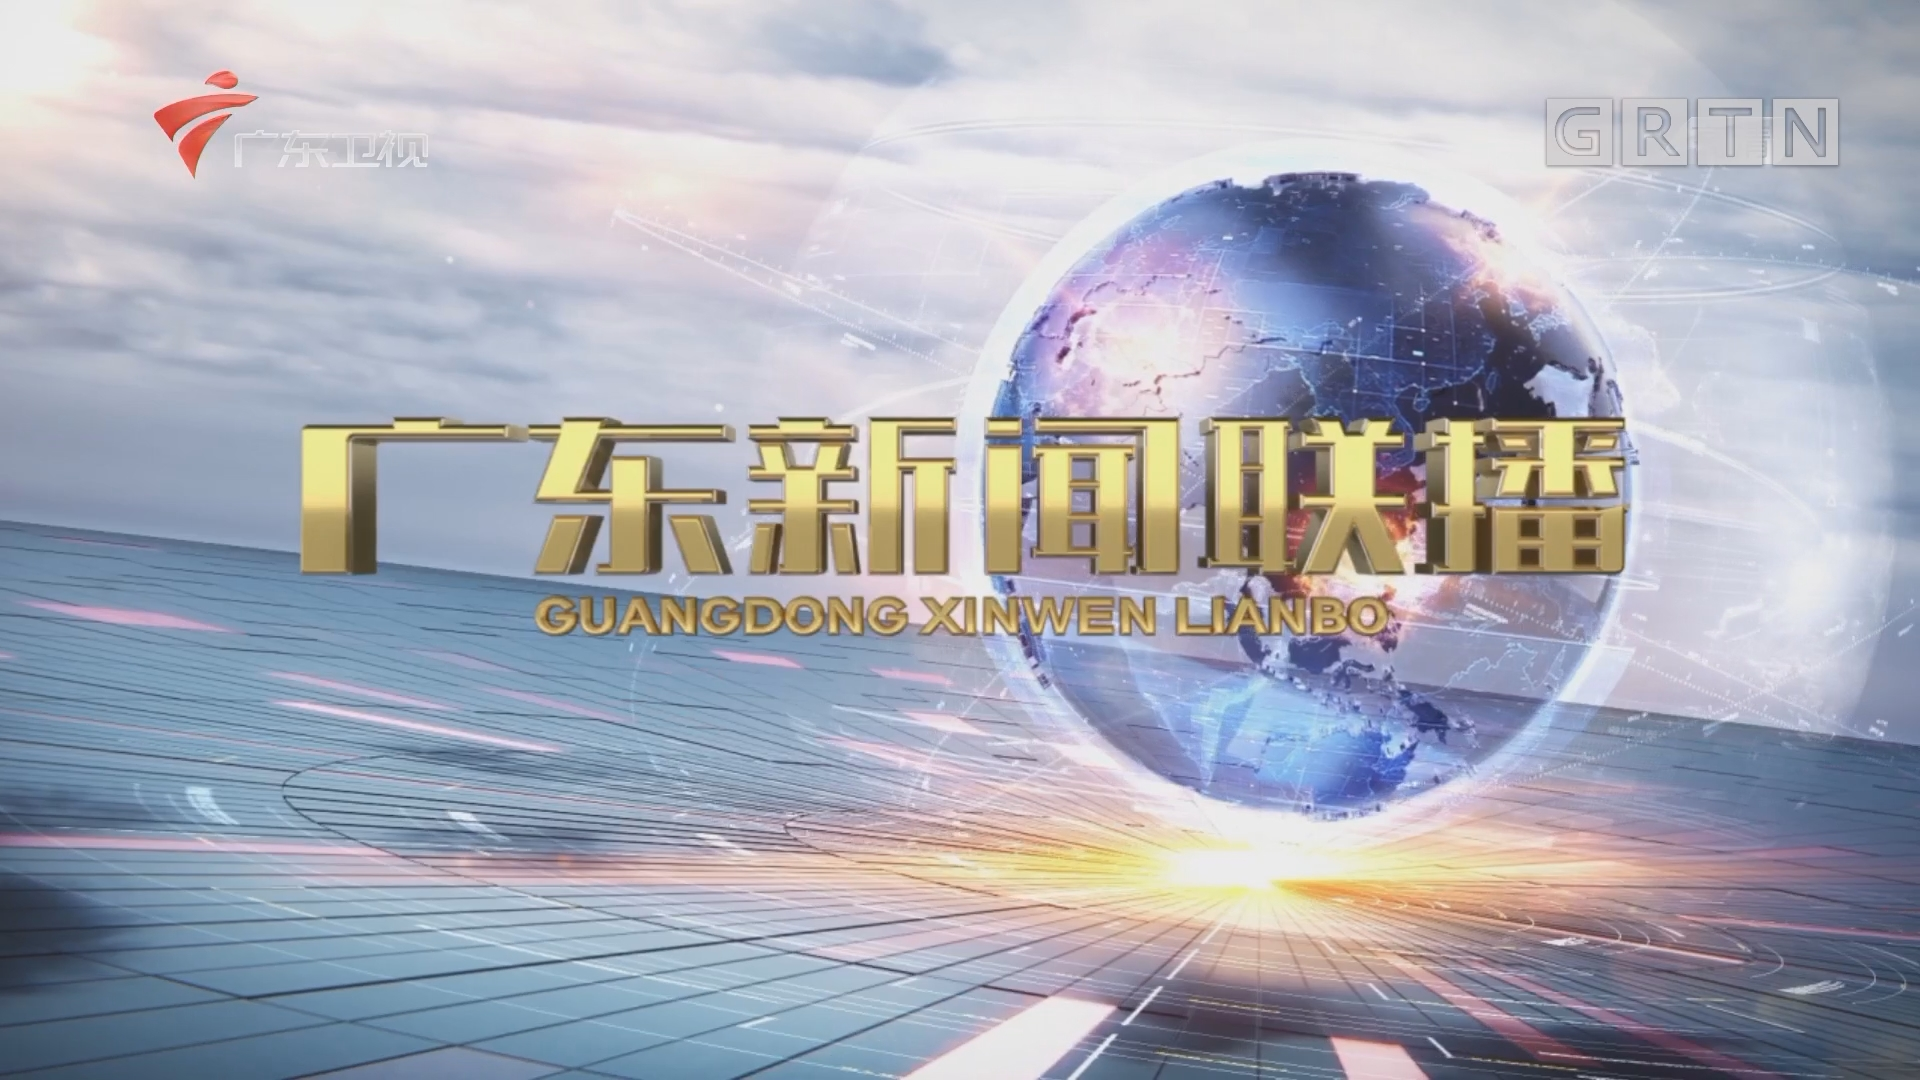 [HD][2019-07-10]广东新闻联播:人民日报发表评论员文章:在加强党的建设上走在前作表率